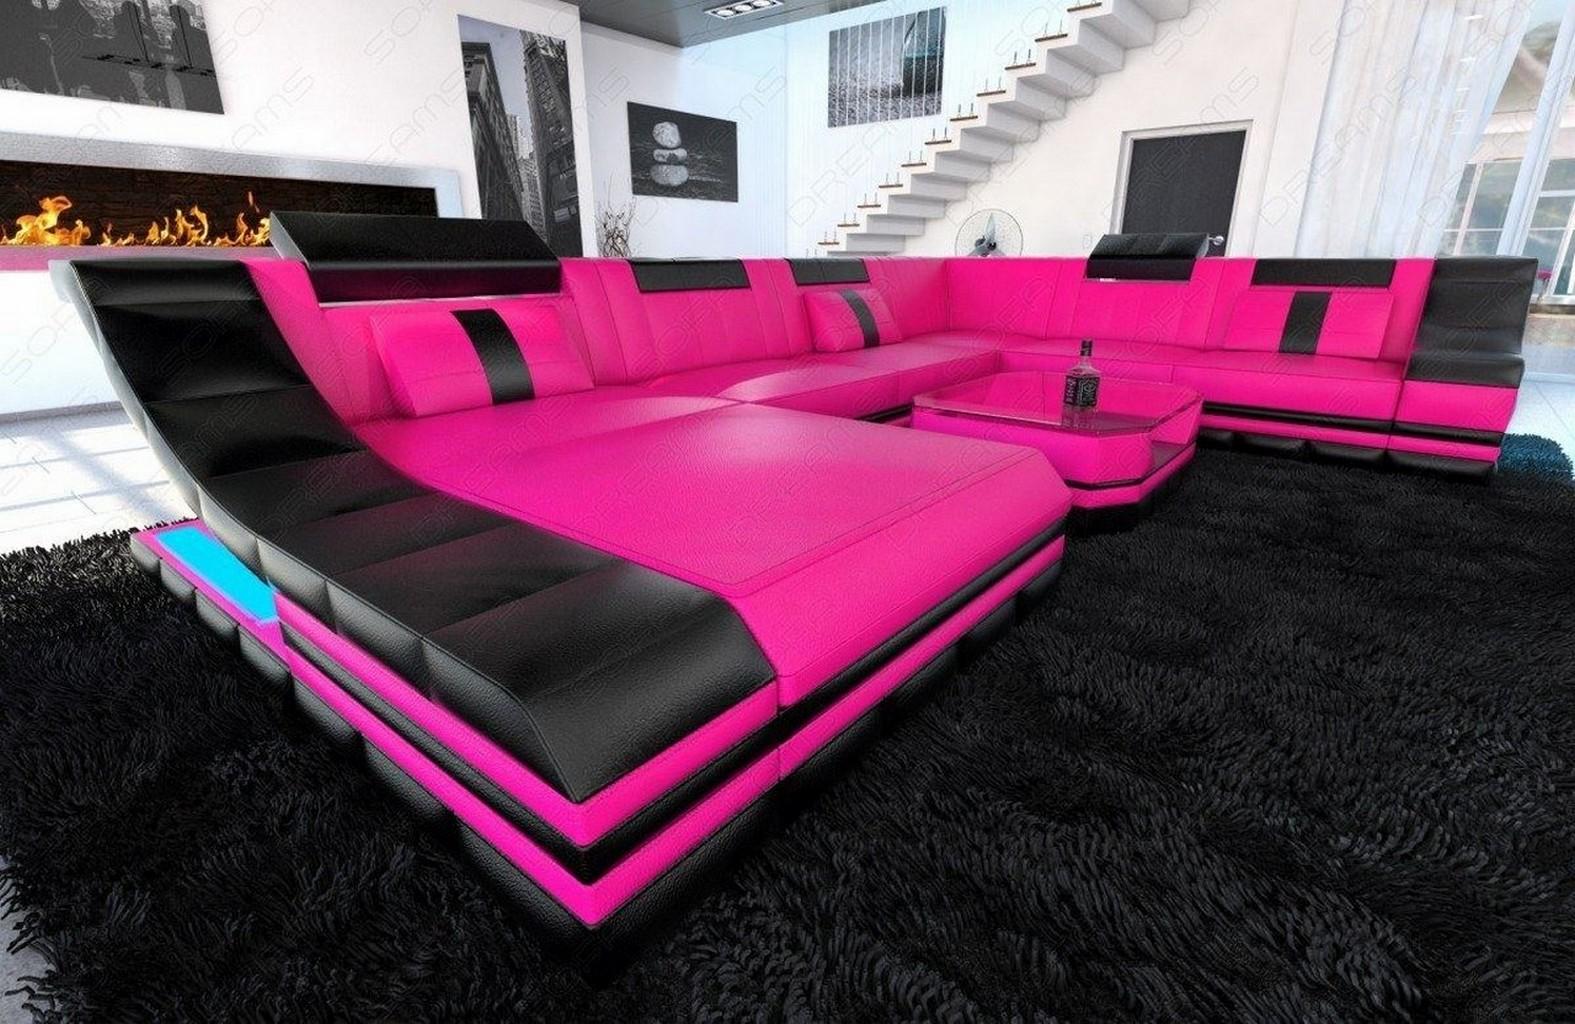 designer wohnlandschaft turino xxl luxus couch led. Black Bedroom Furniture Sets. Home Design Ideas